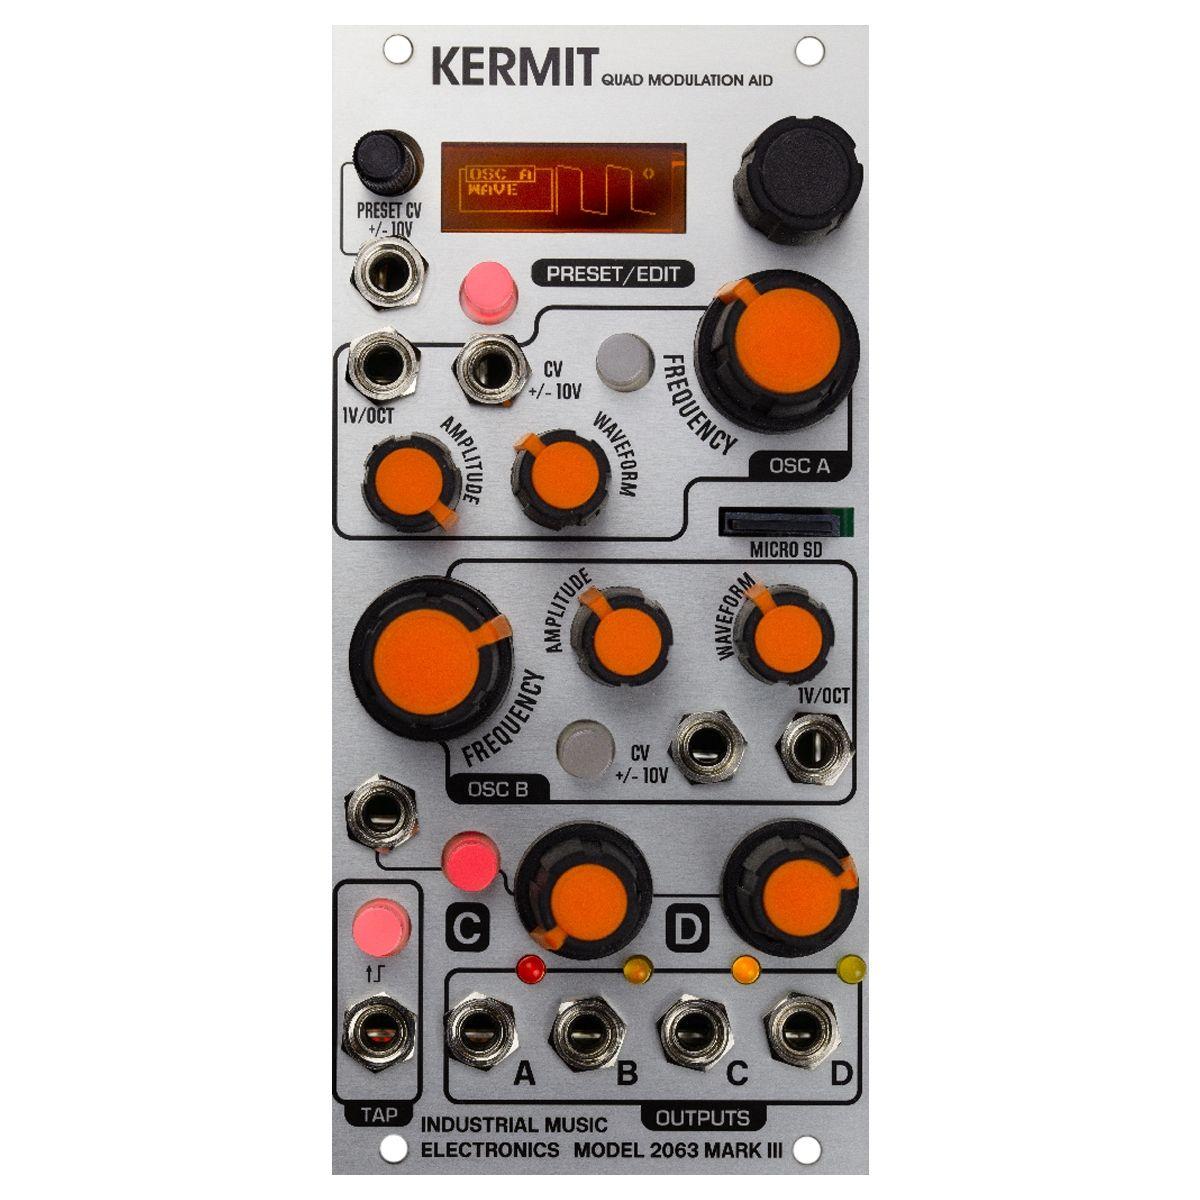 Industrial Music Electronics Kermit MK III Eurorack 4 Channel Modulation Module